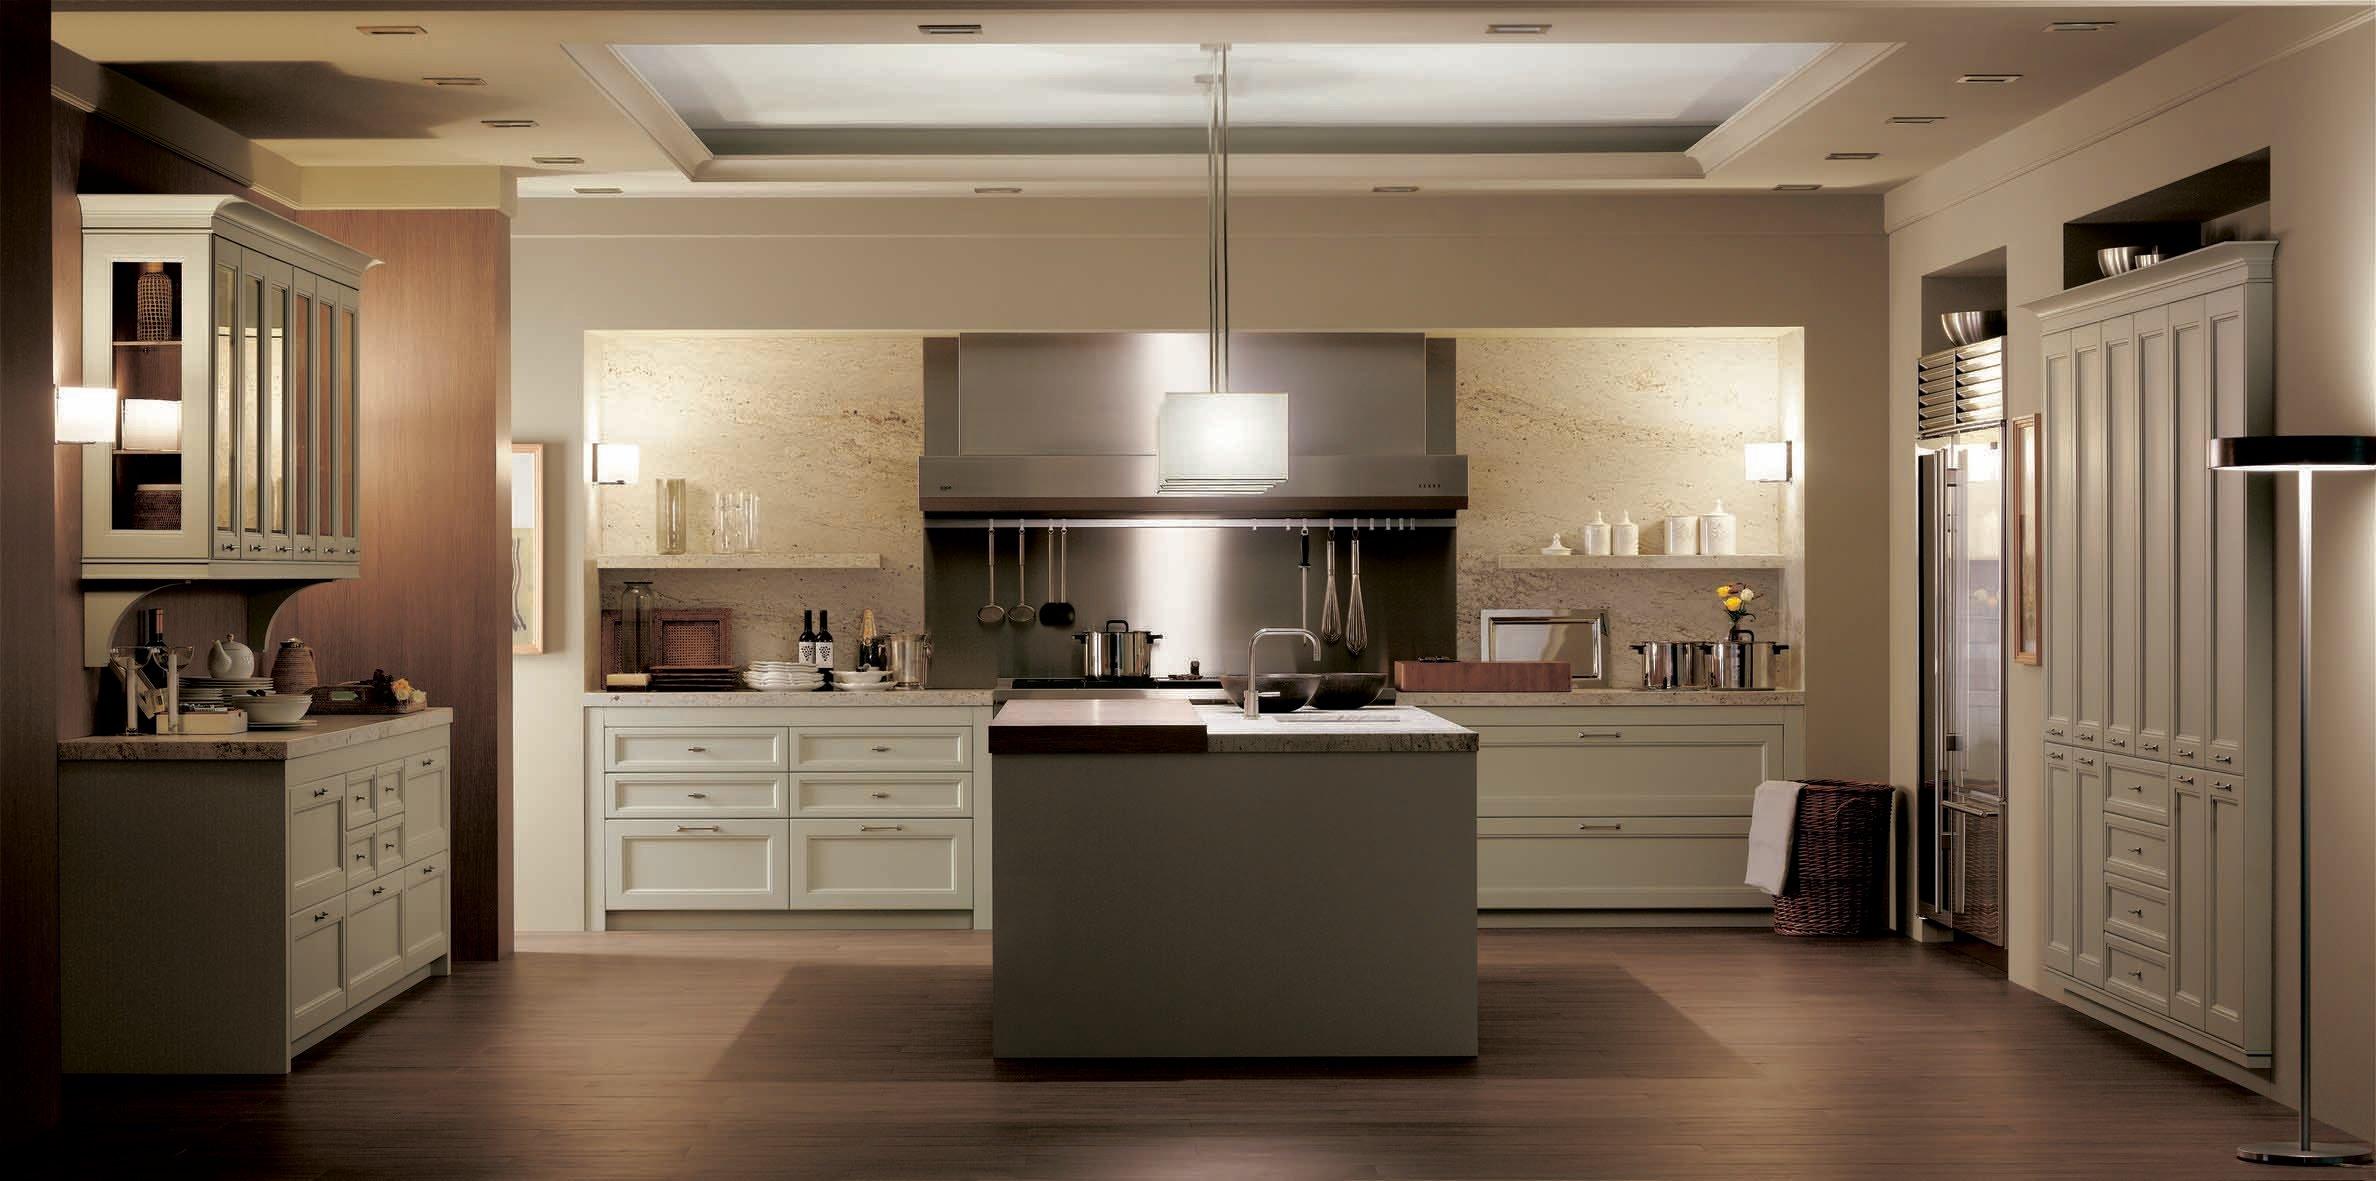 Cocinas hogare as capri gunni trentino - Gunni trentino cocinas ...